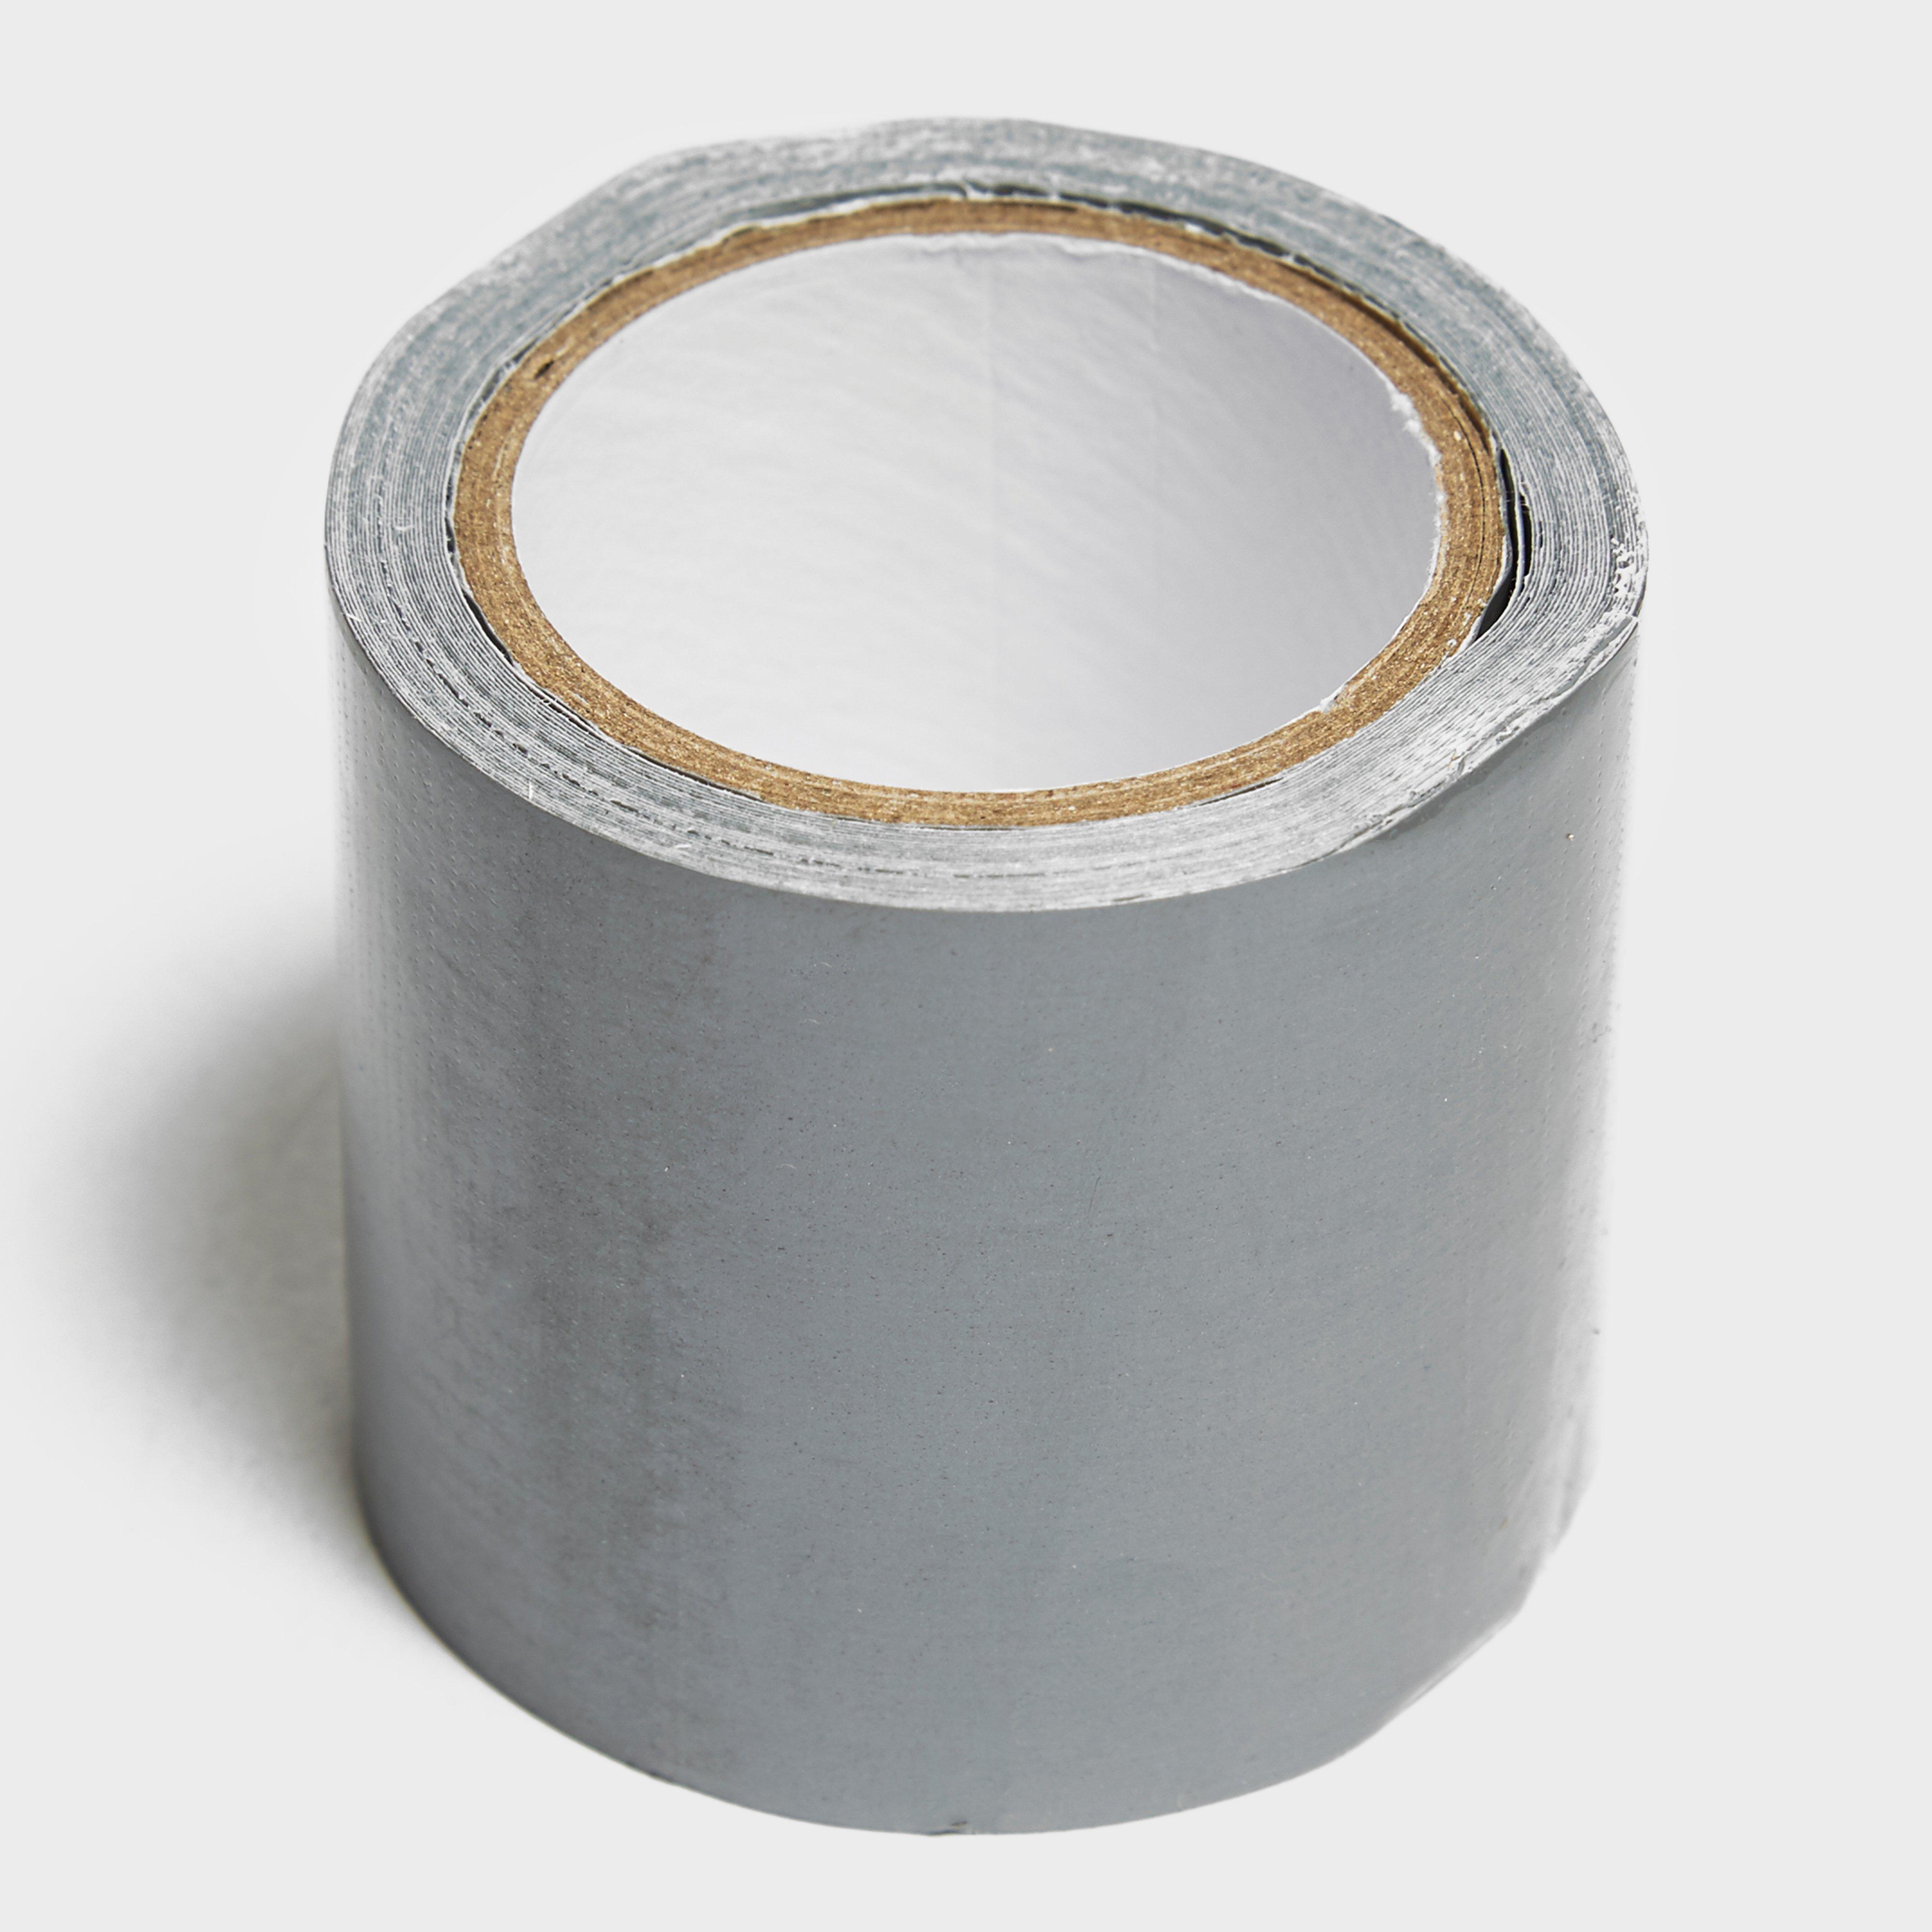 Lifeventure Lifeventure Duct Tape - Silver, Silver